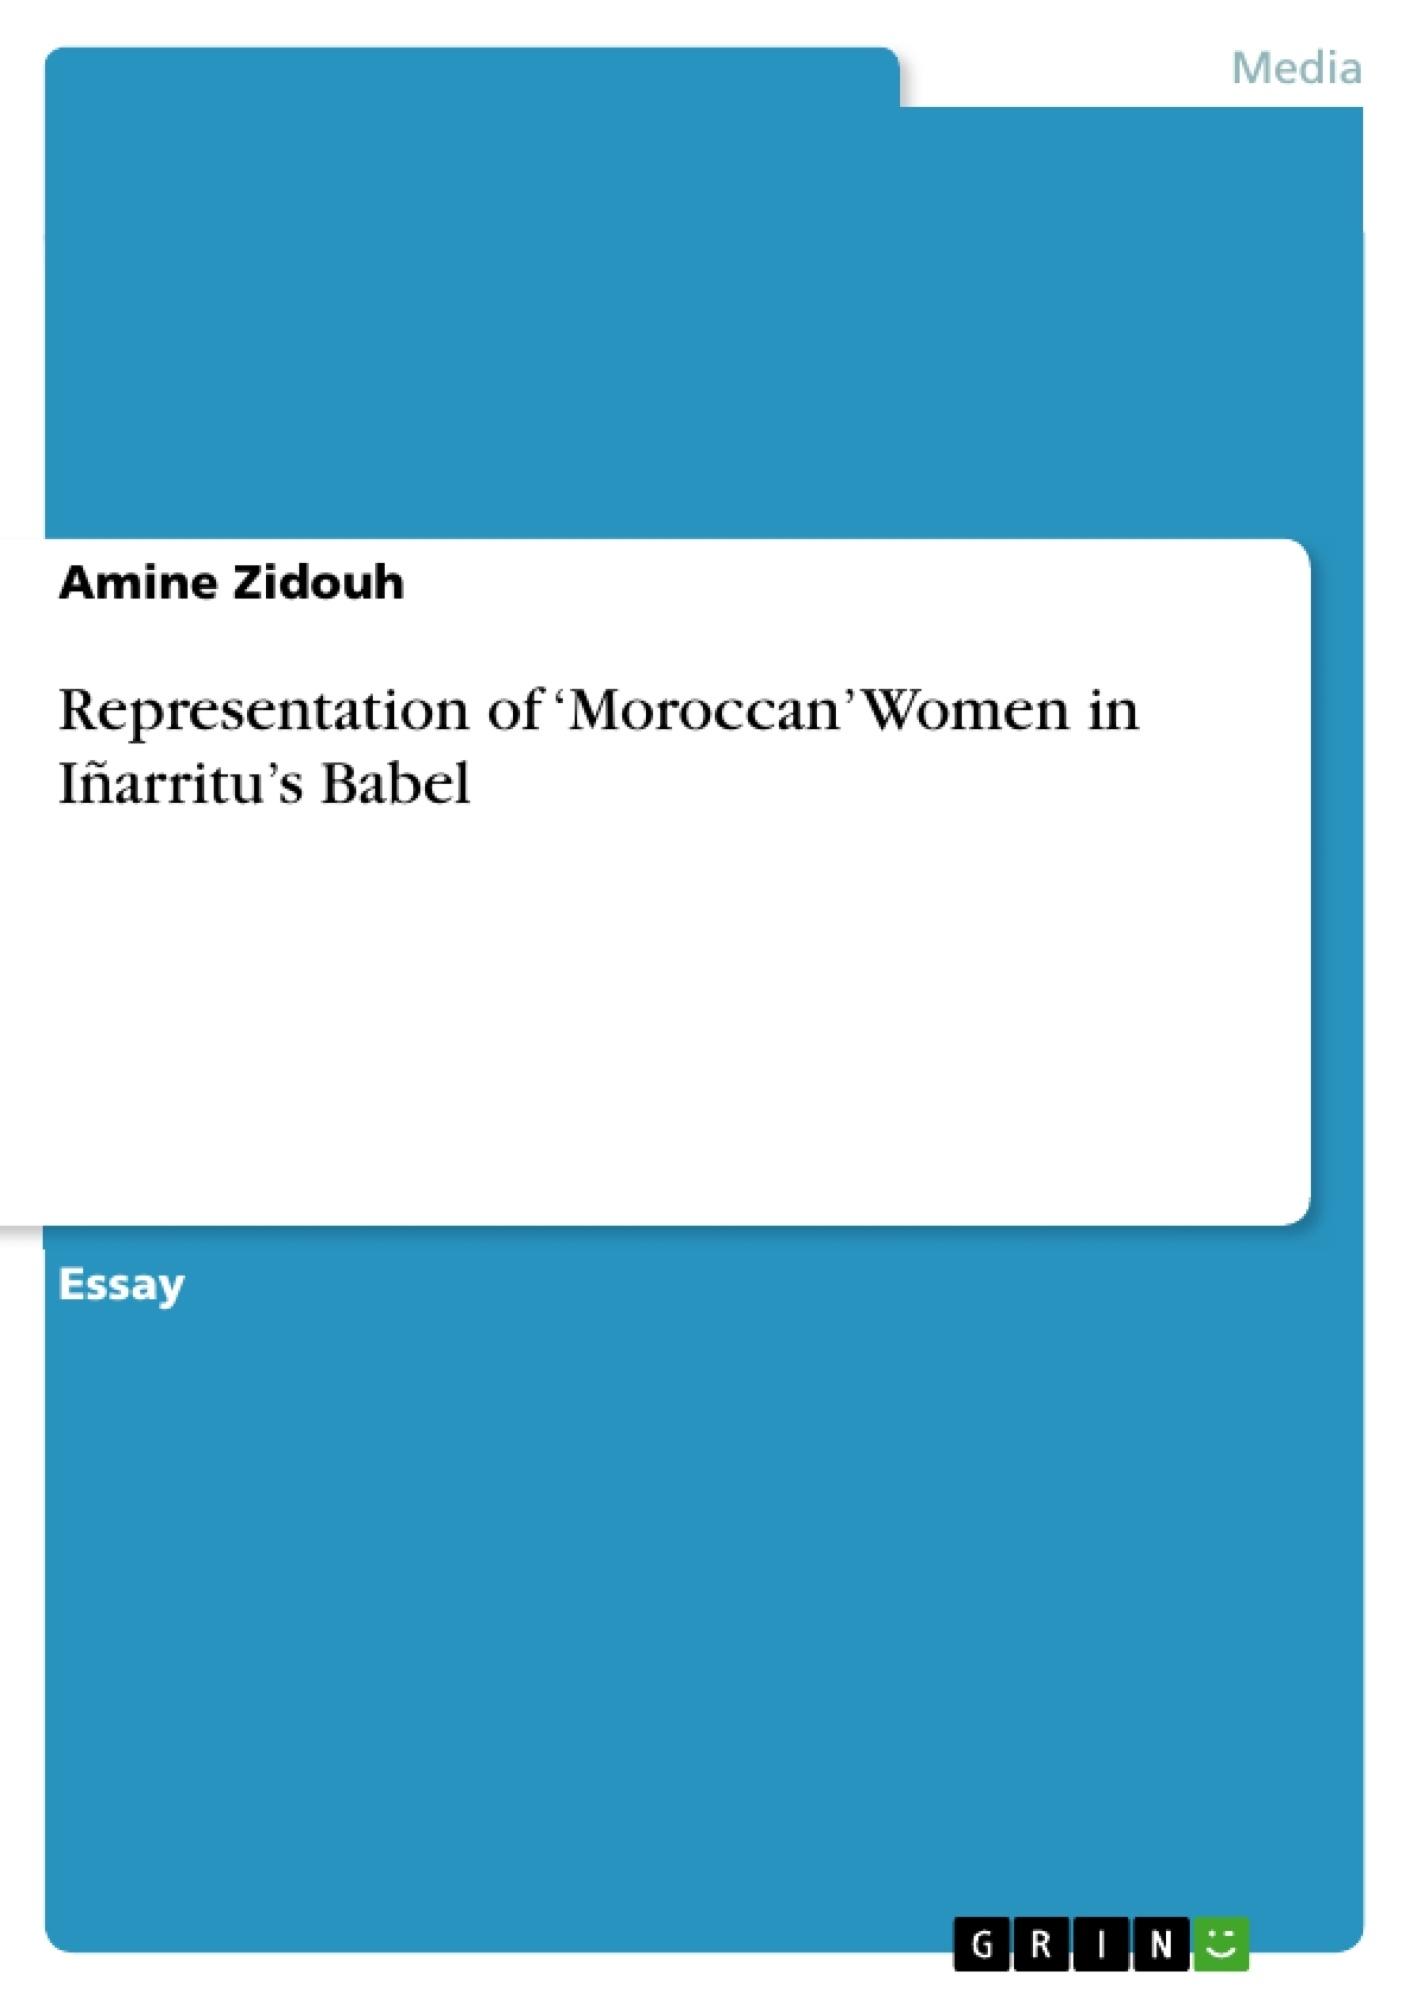 Title: Representation of 'Moroccan' Women in Iñarritu's Babel